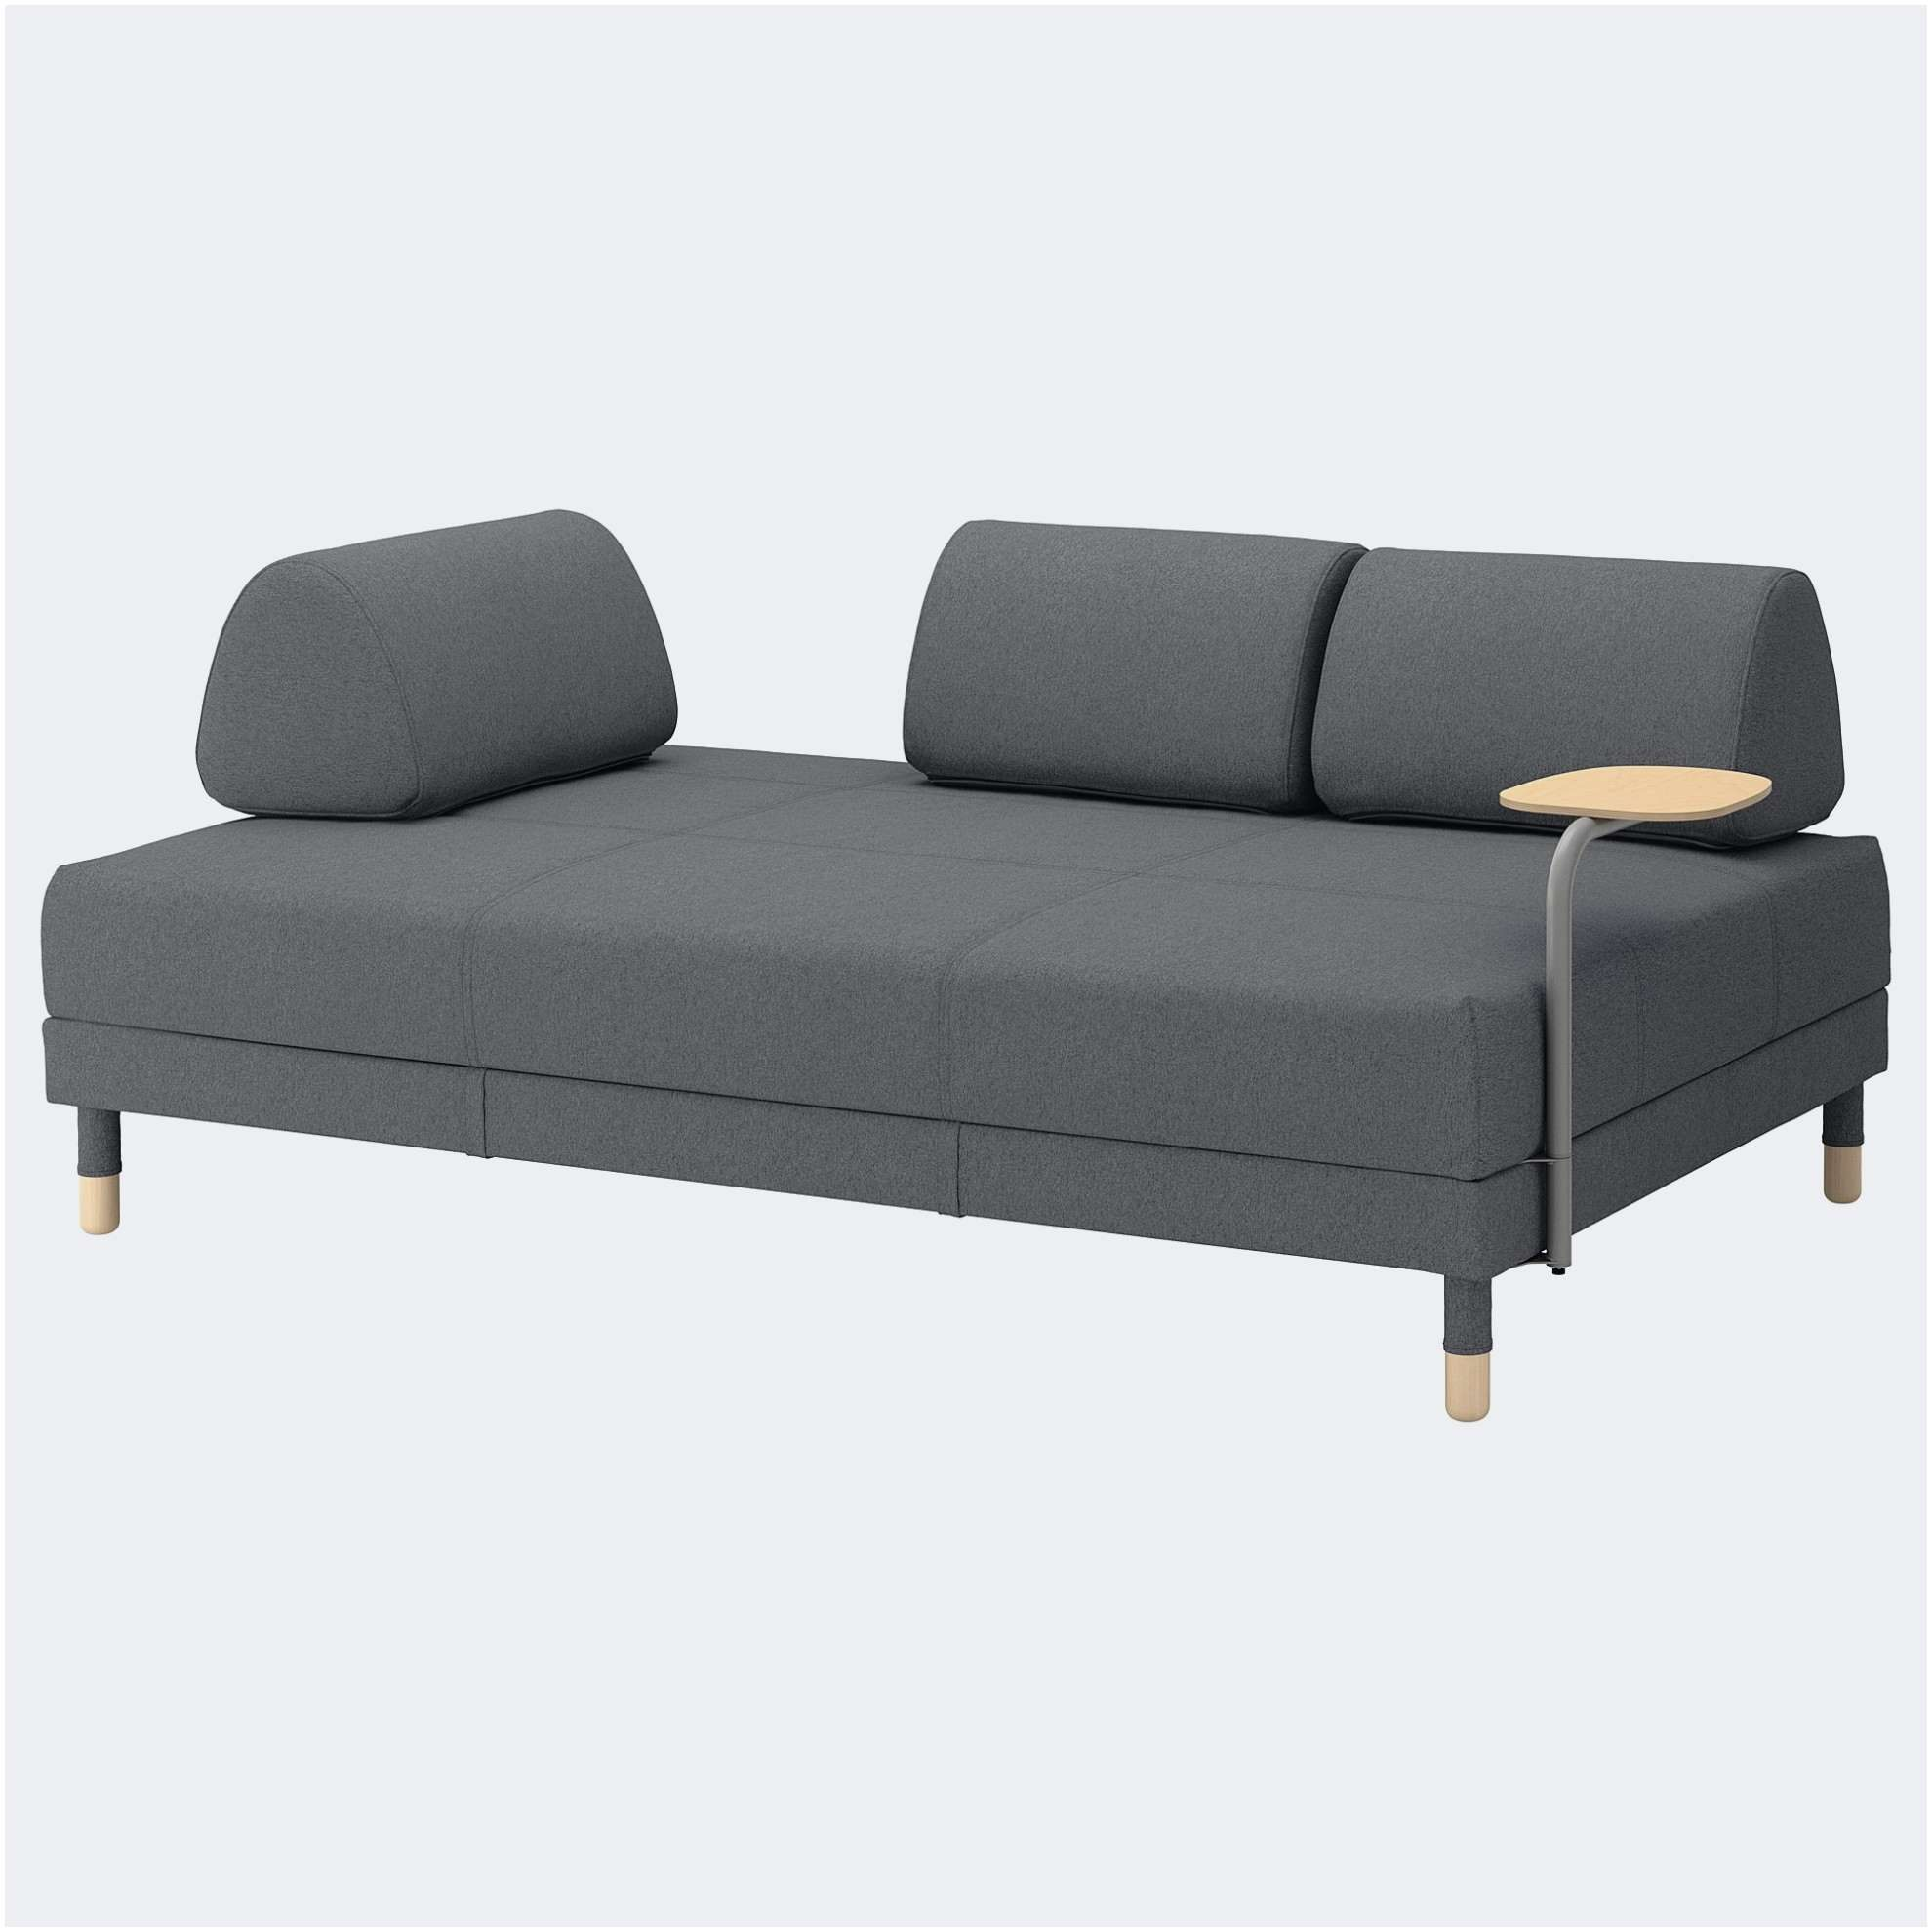 Ikea Canapé Lit Convertible Bel Luxe Le Meilleur De Avec Superbe Canapé Lit Convertible Pour Votre